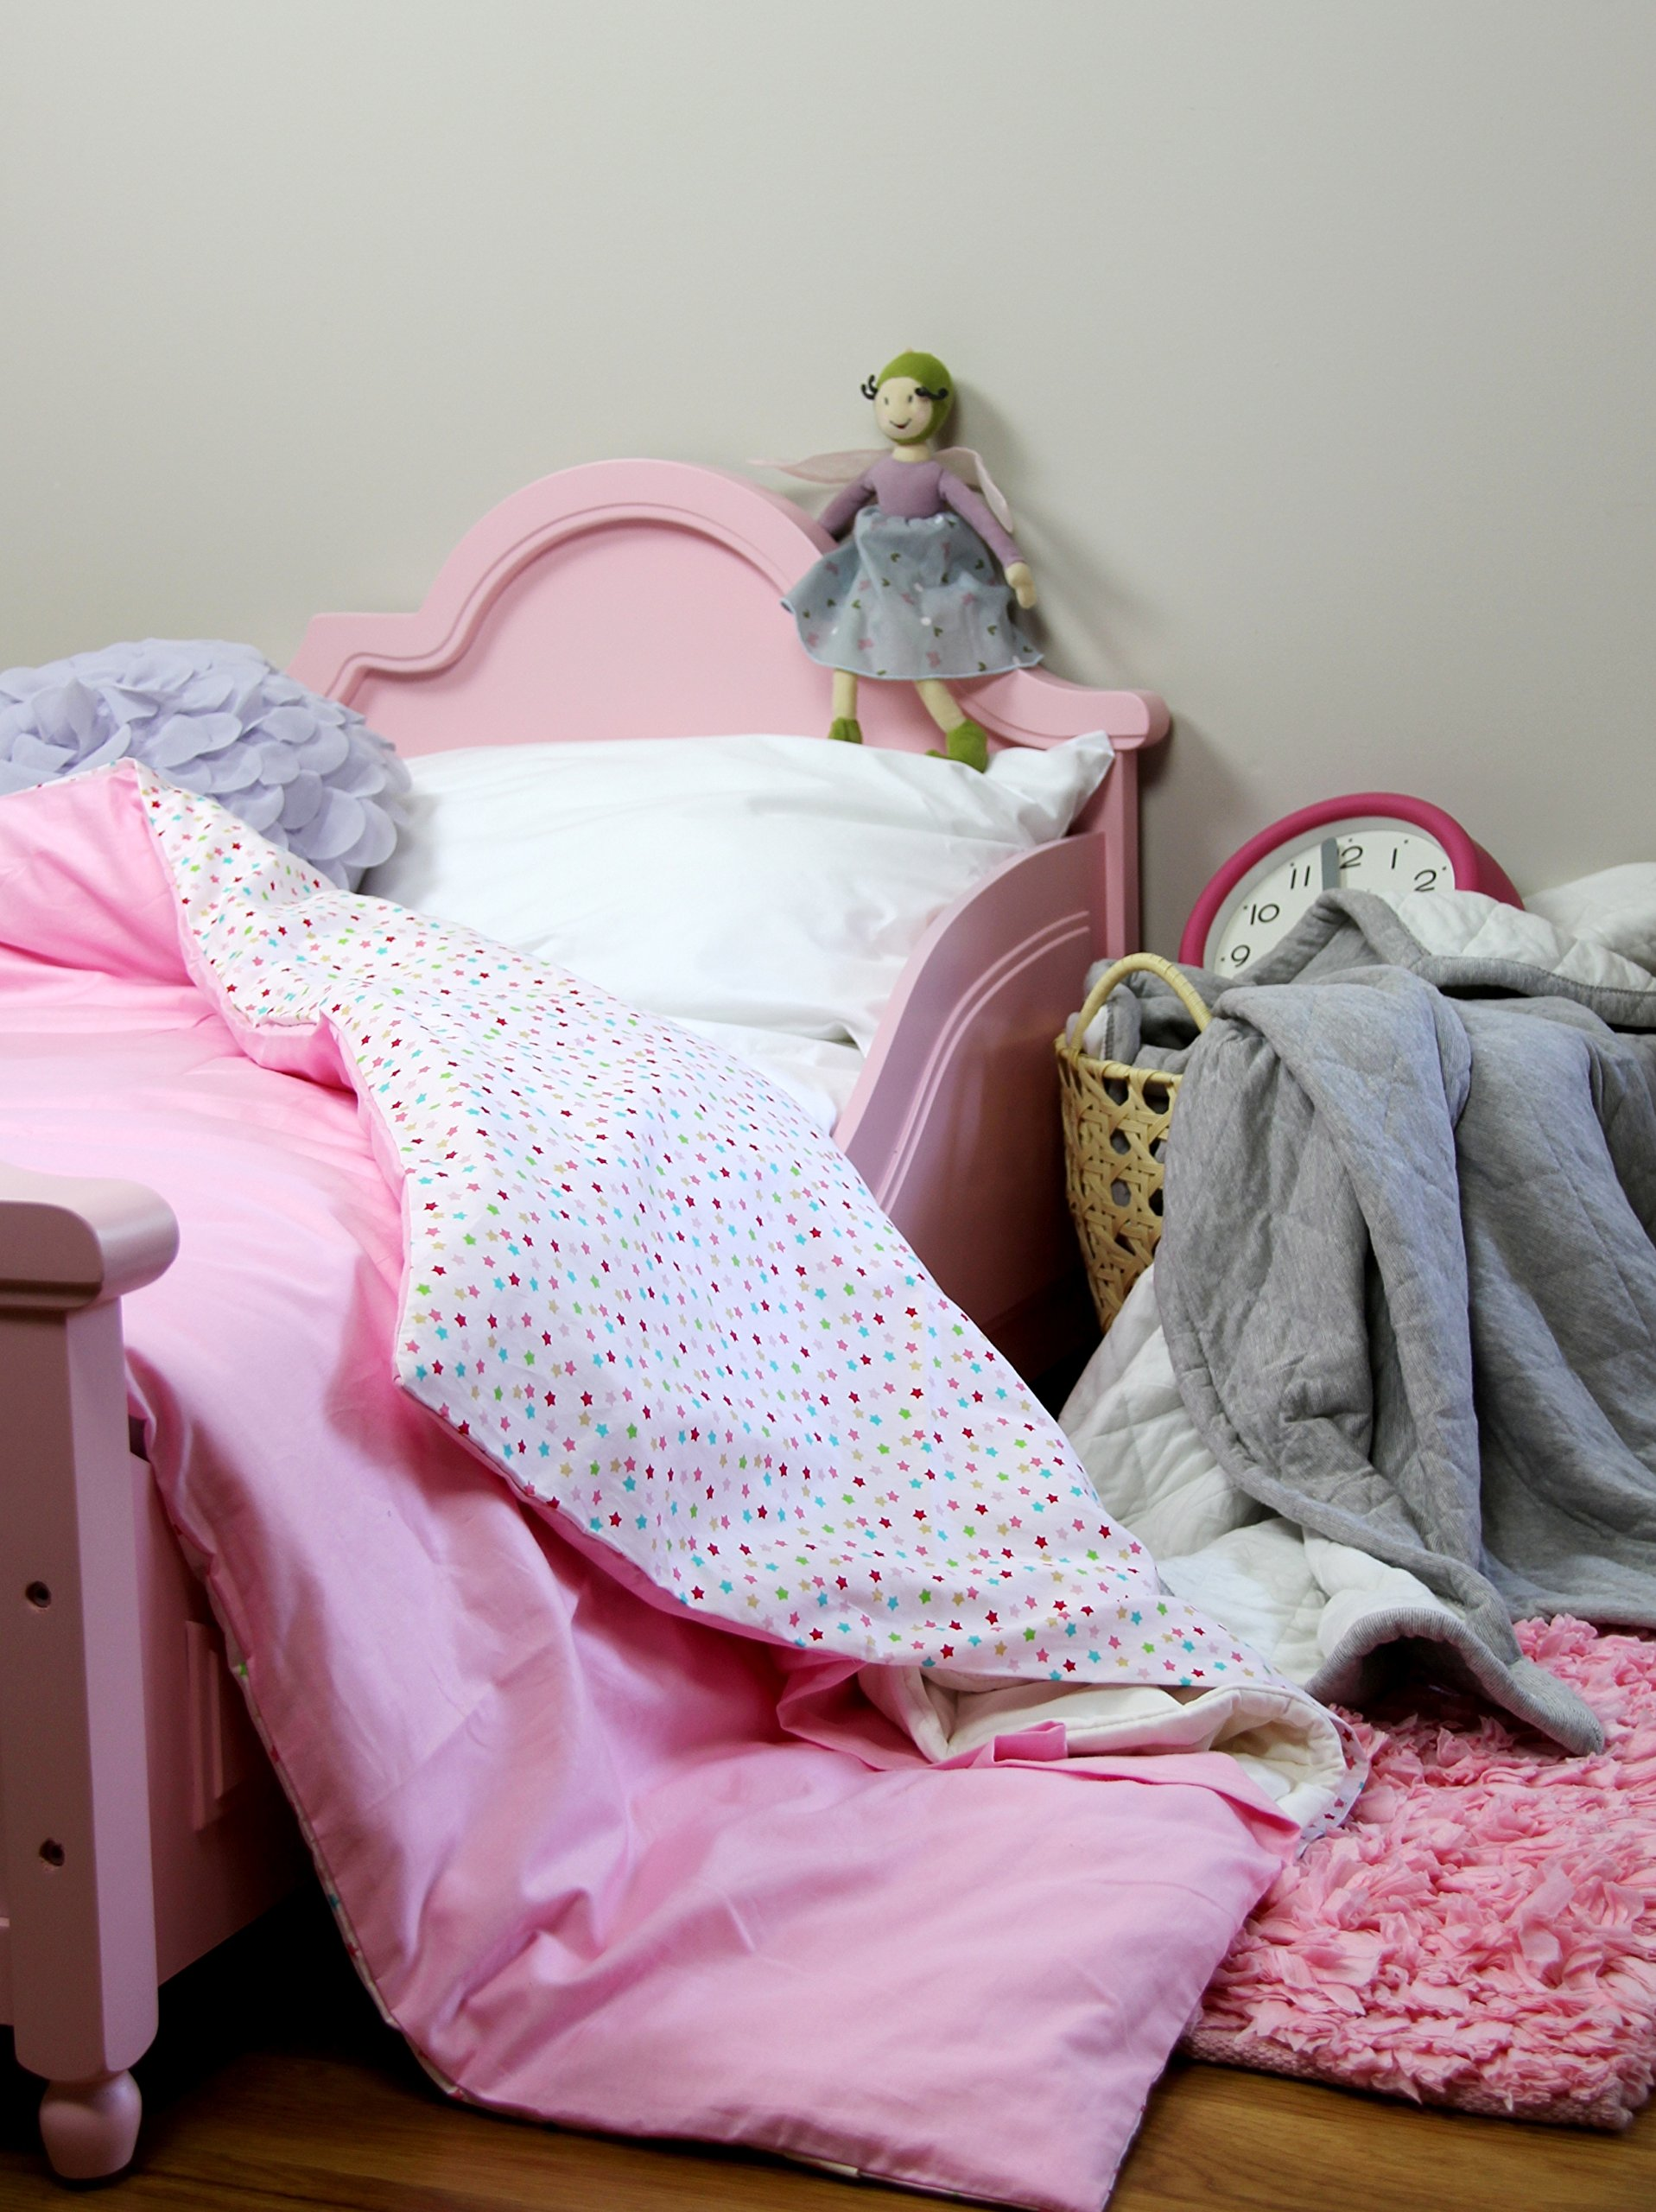 Cotton Flower Toddler Quilt (Quilt + Duvet Cover), Warmer (Fairyland) by Cotton Flower Baby